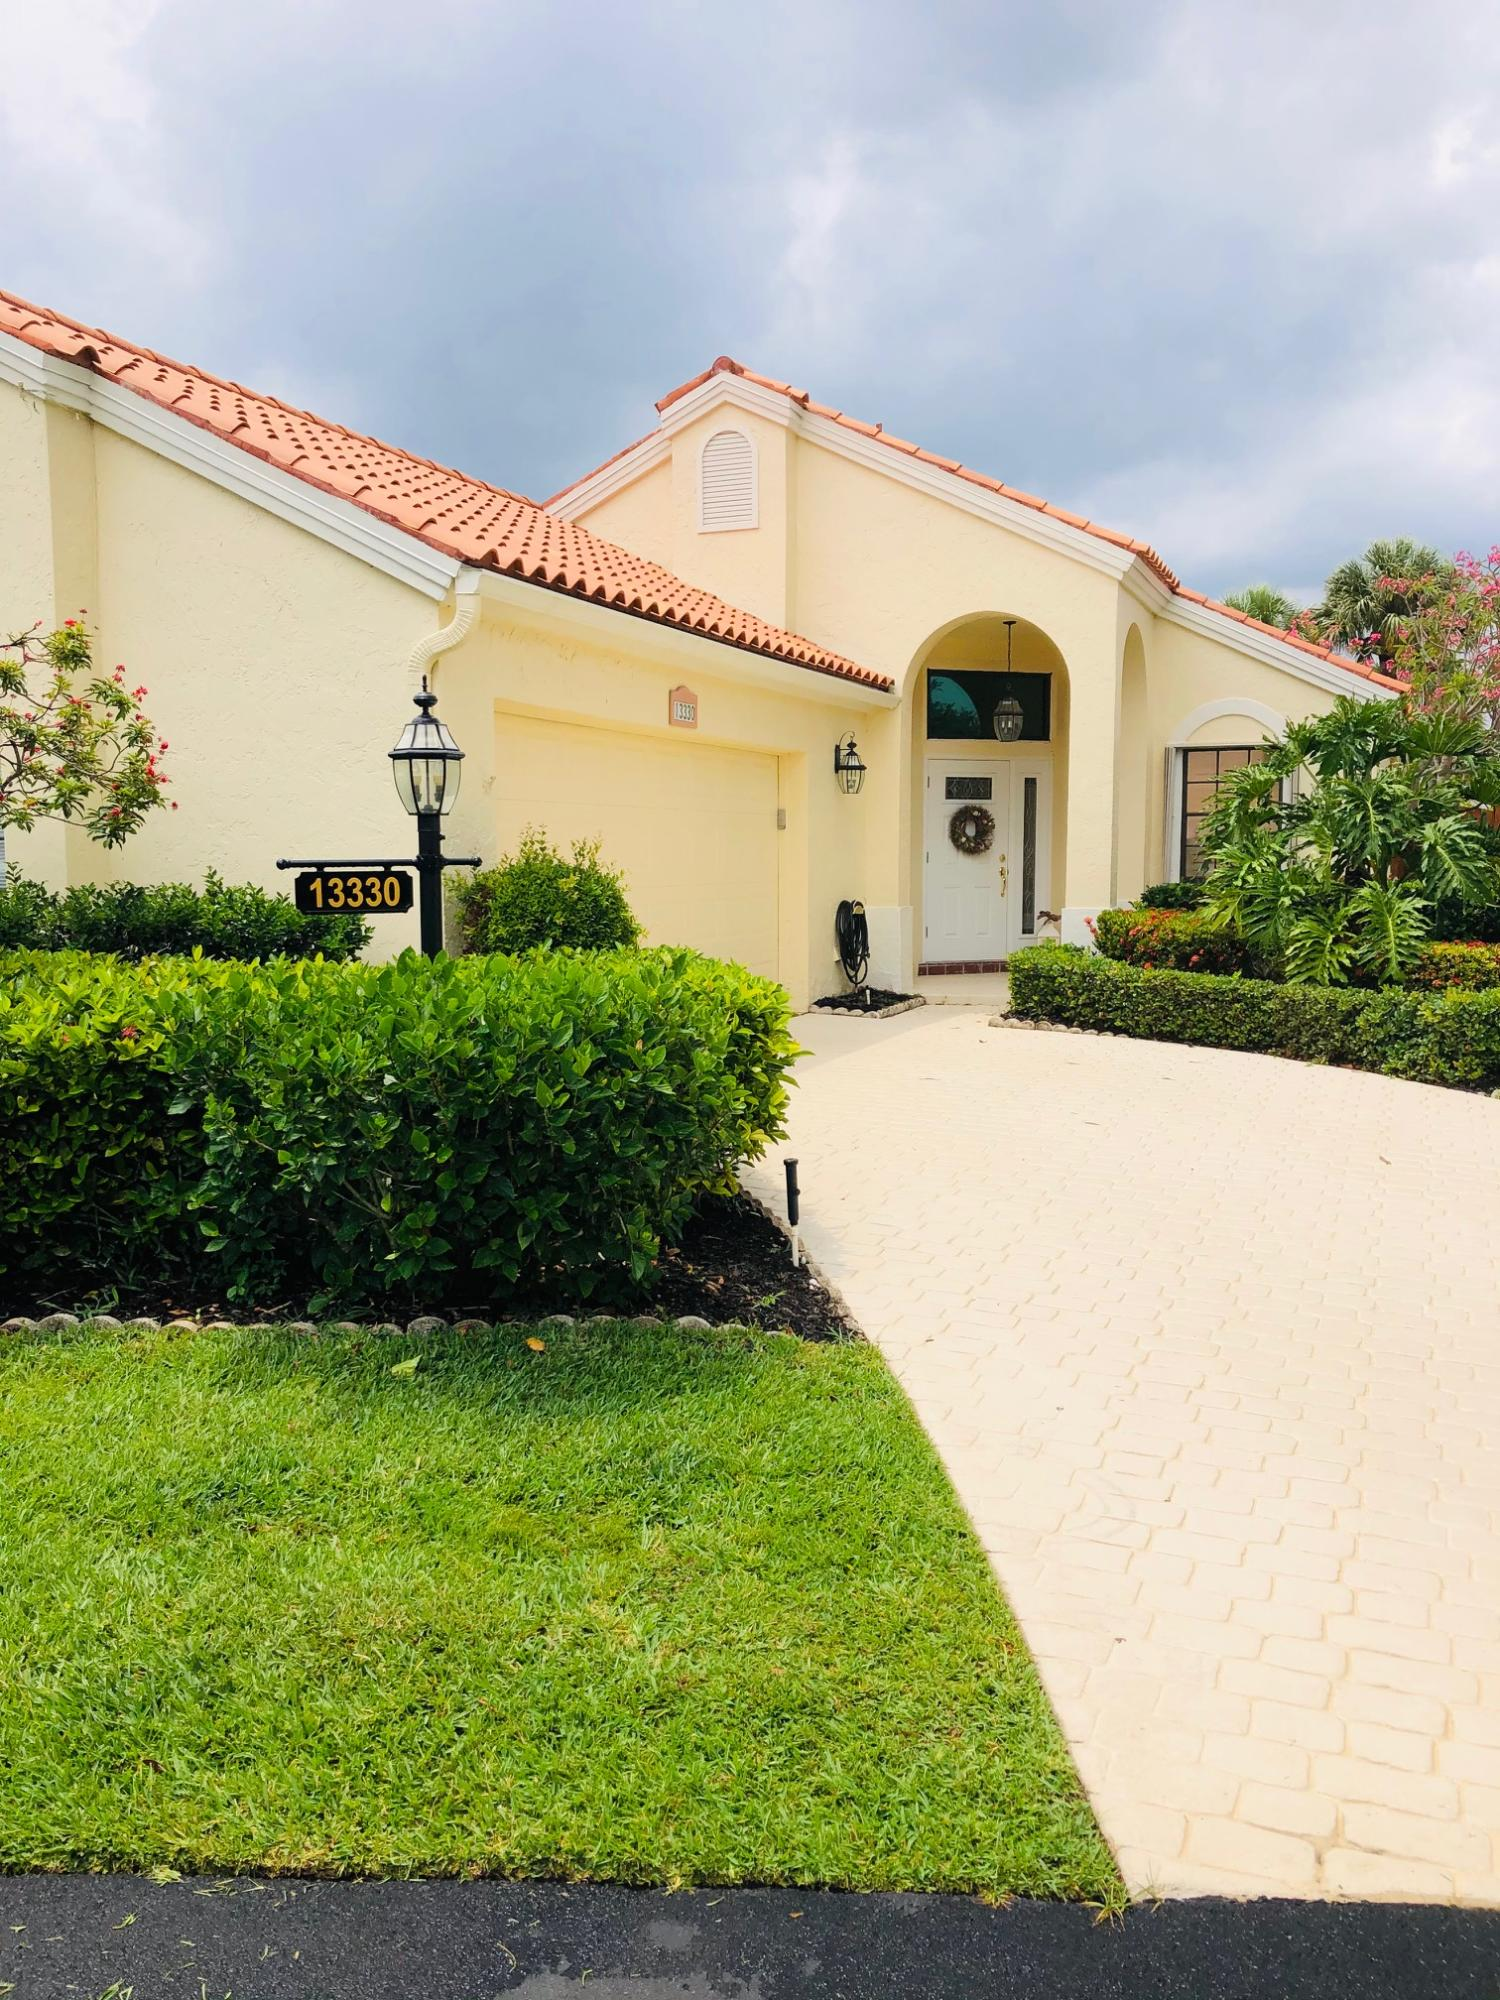 13330 St Tropez Circle, Palm Beach Gardens, FL 33410